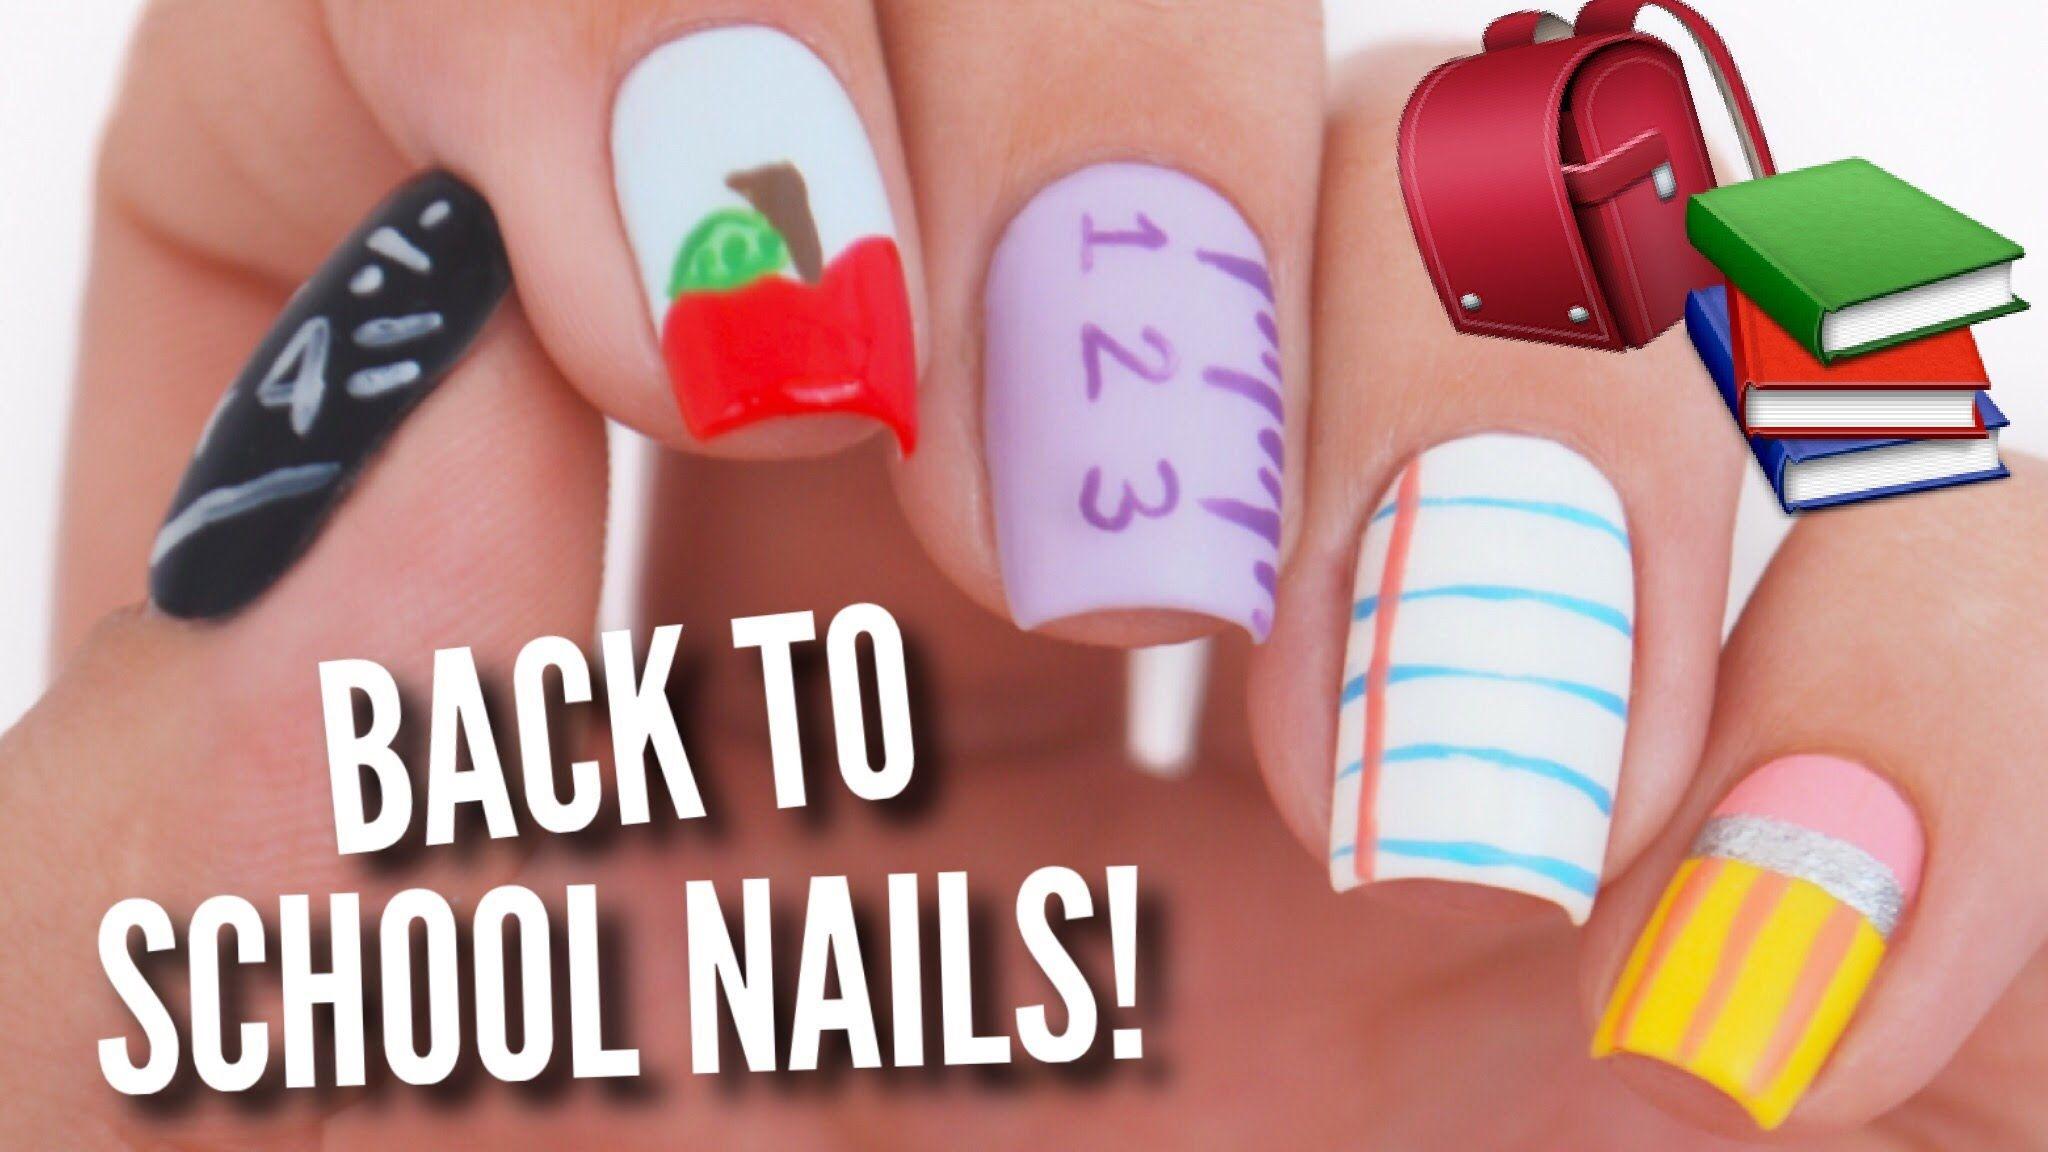 5 Back To School Diy Easy Nail Art Designs You